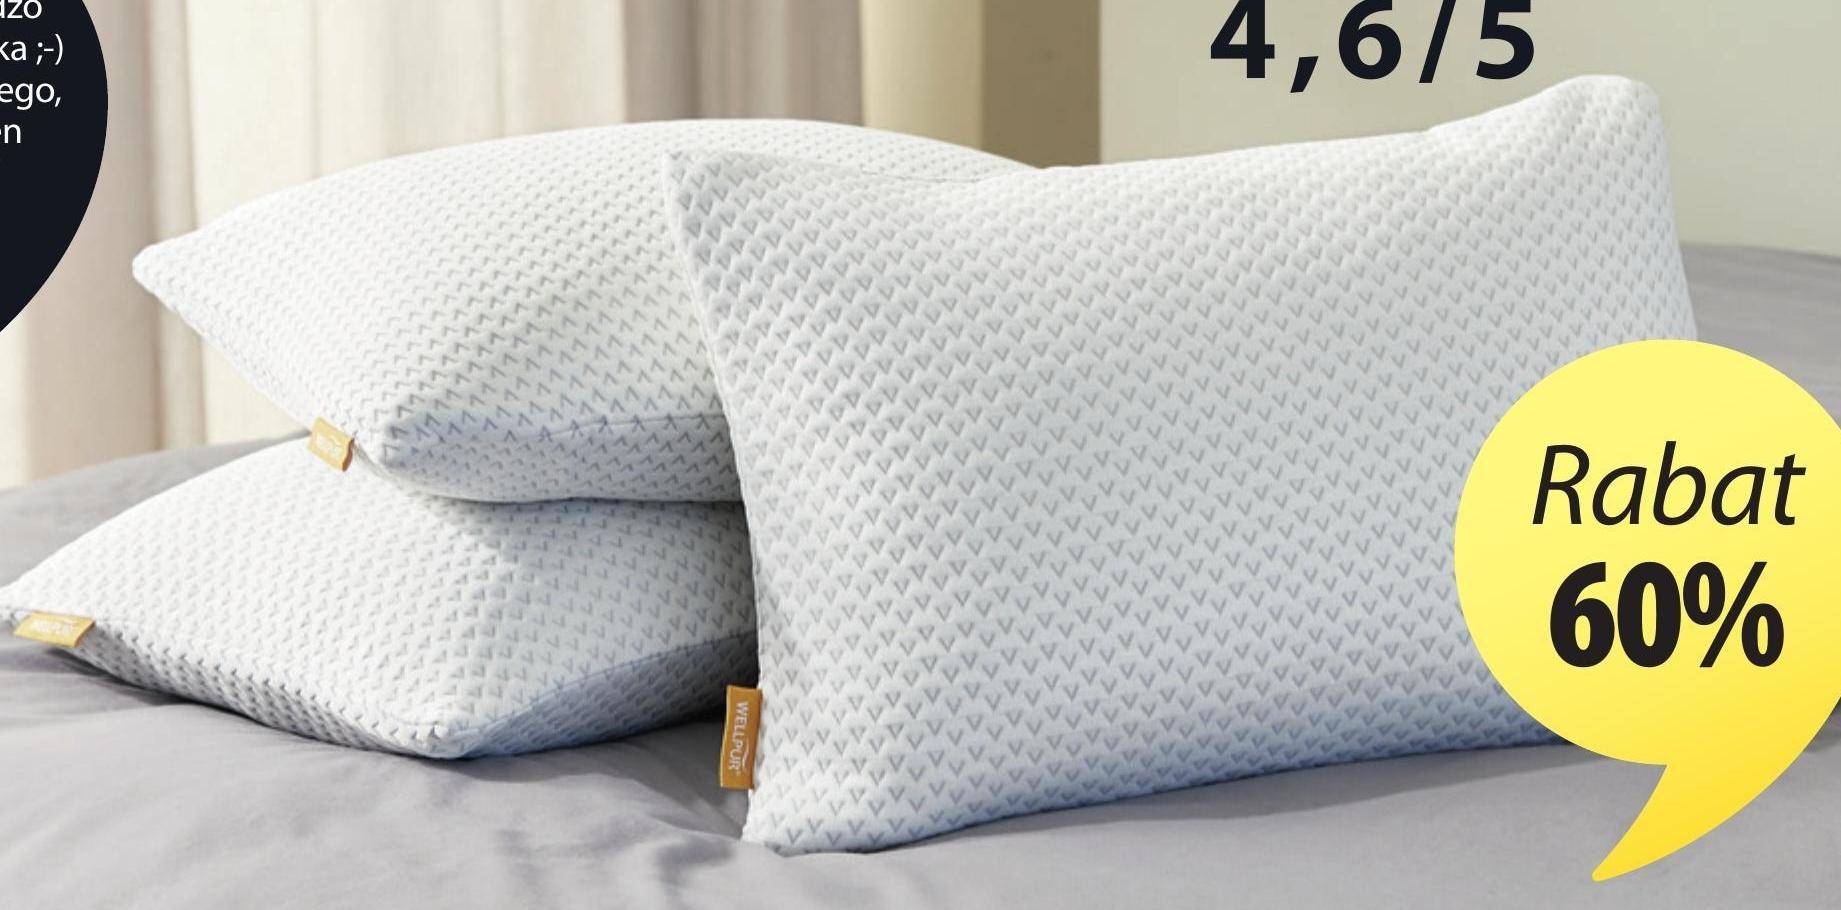 Poduszka Wellpur niska cena